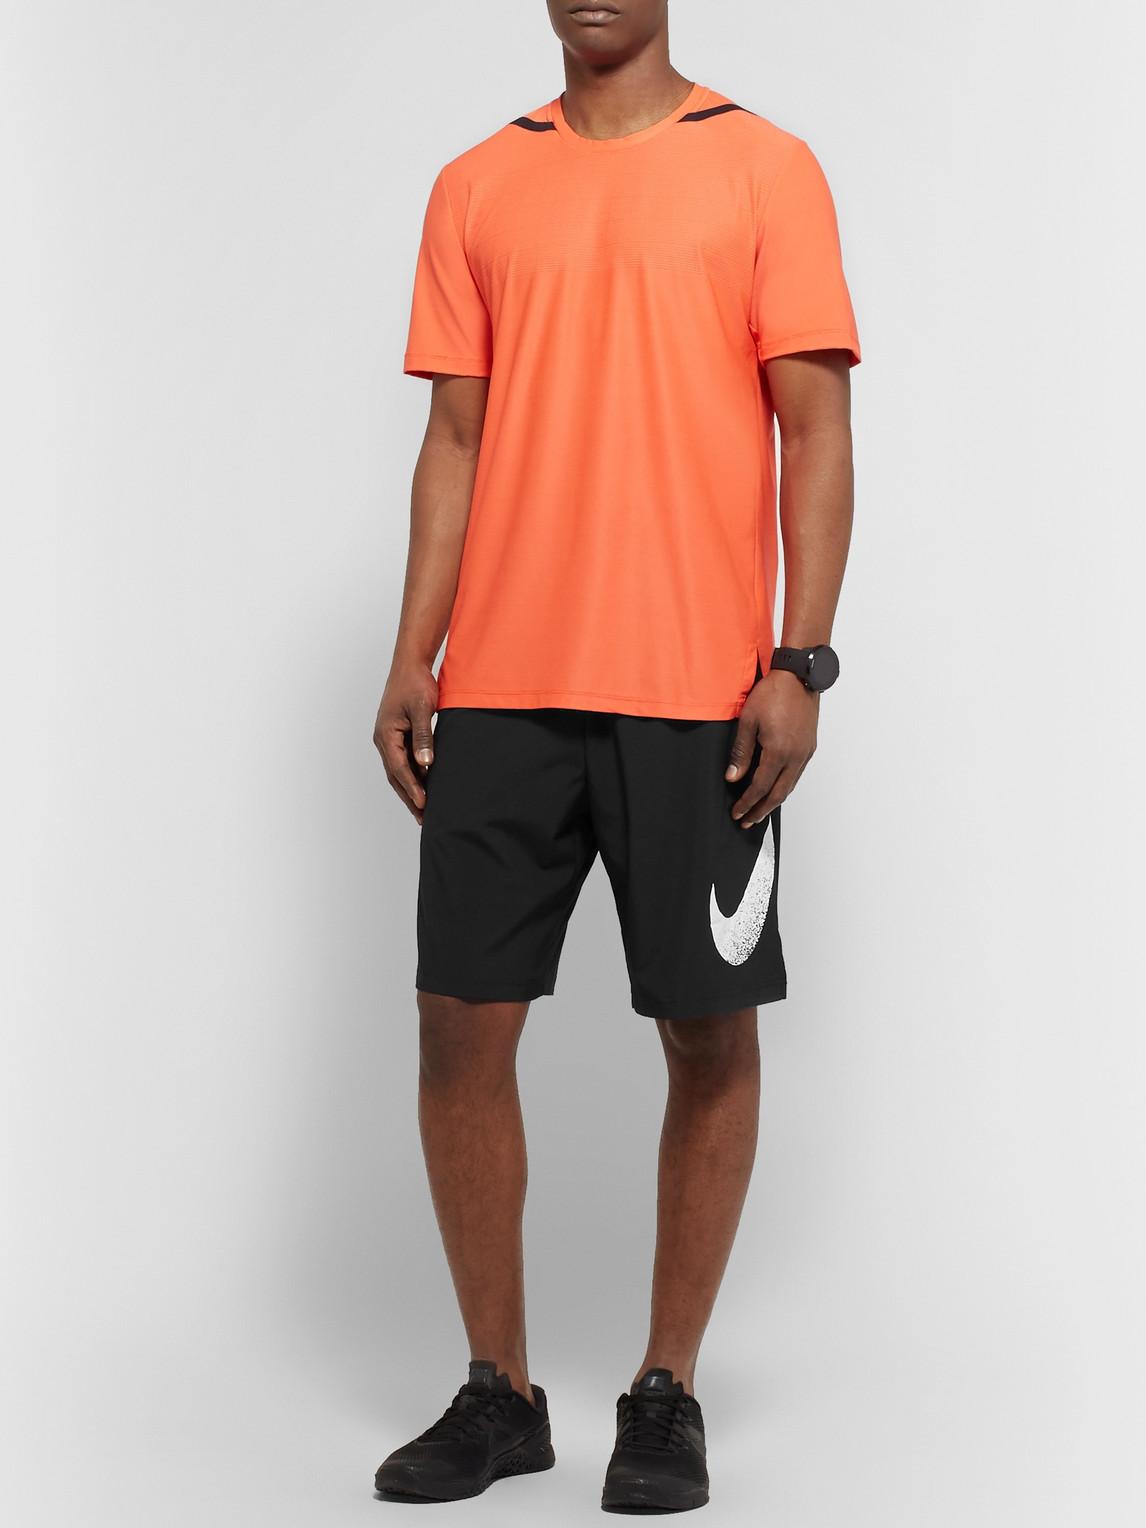 Nike Tops FLEX 2.0 LOGO